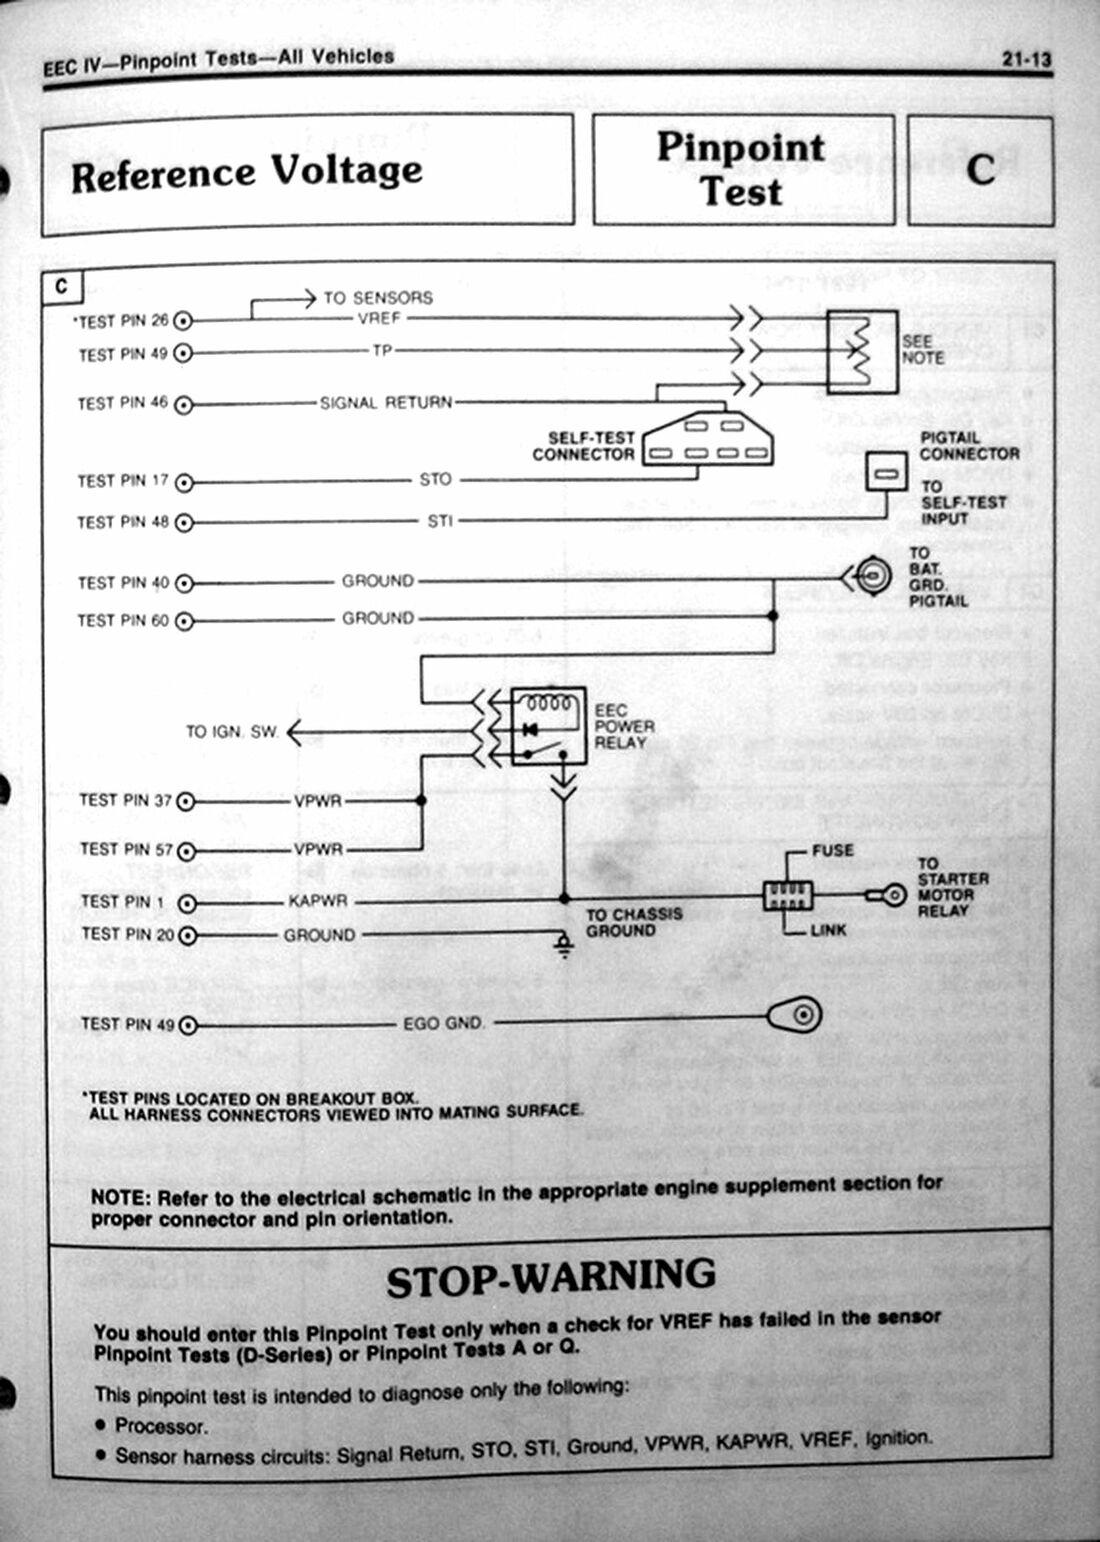 eec iv wiring diagram 4 9 advance wiring diagram eec iv wiring diagram 4 9 [ 1100 x 1542 Pixel ]